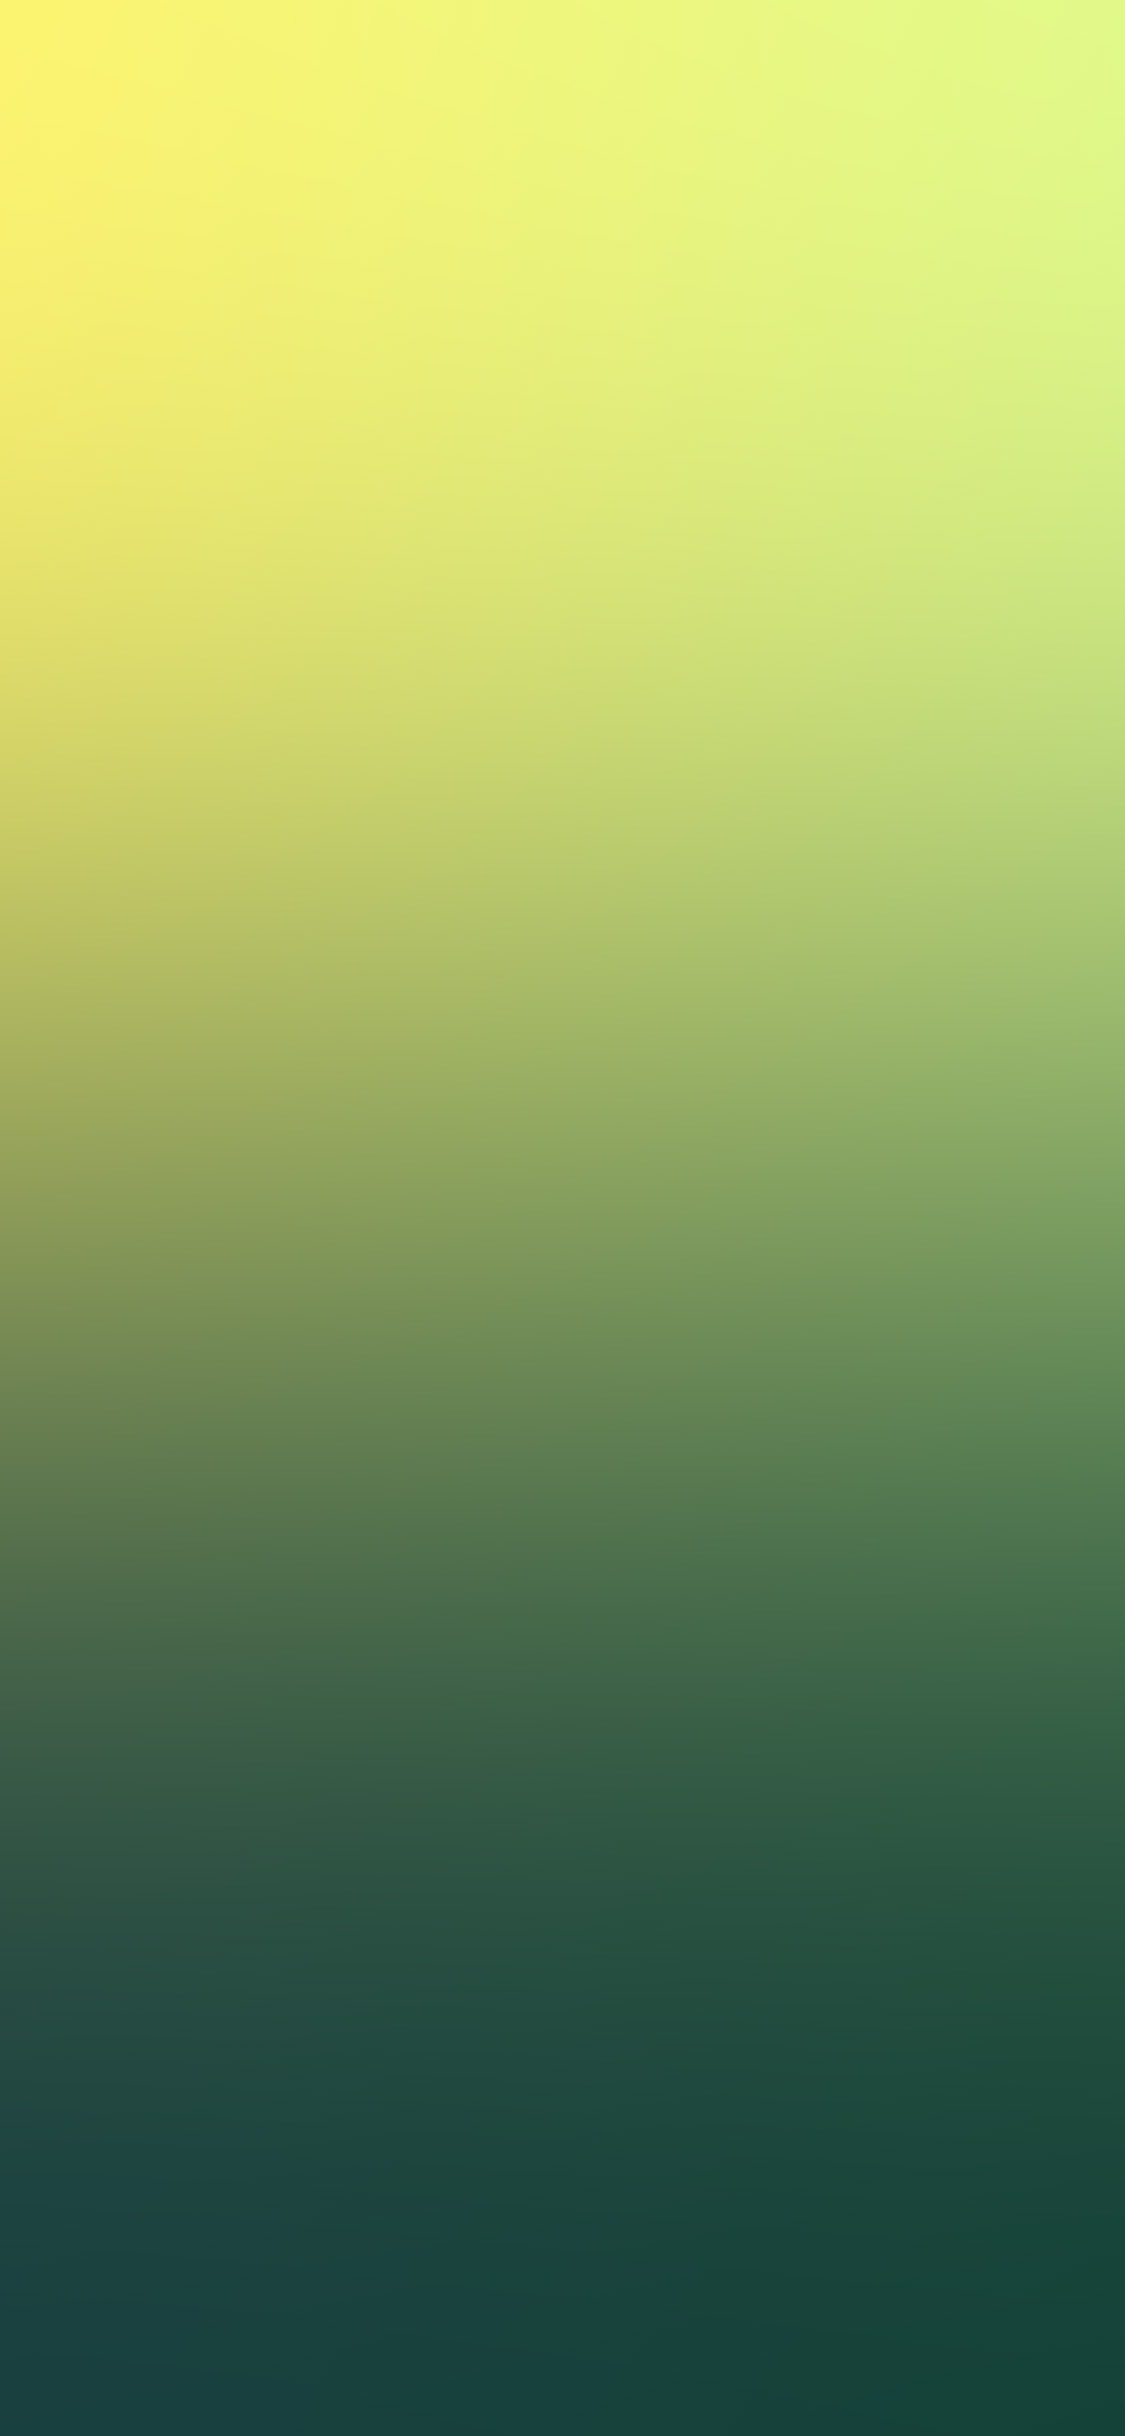 iPhonexpapers.com-Apple-iPhone-wallpaper-so35-blur-gradation-green-soft